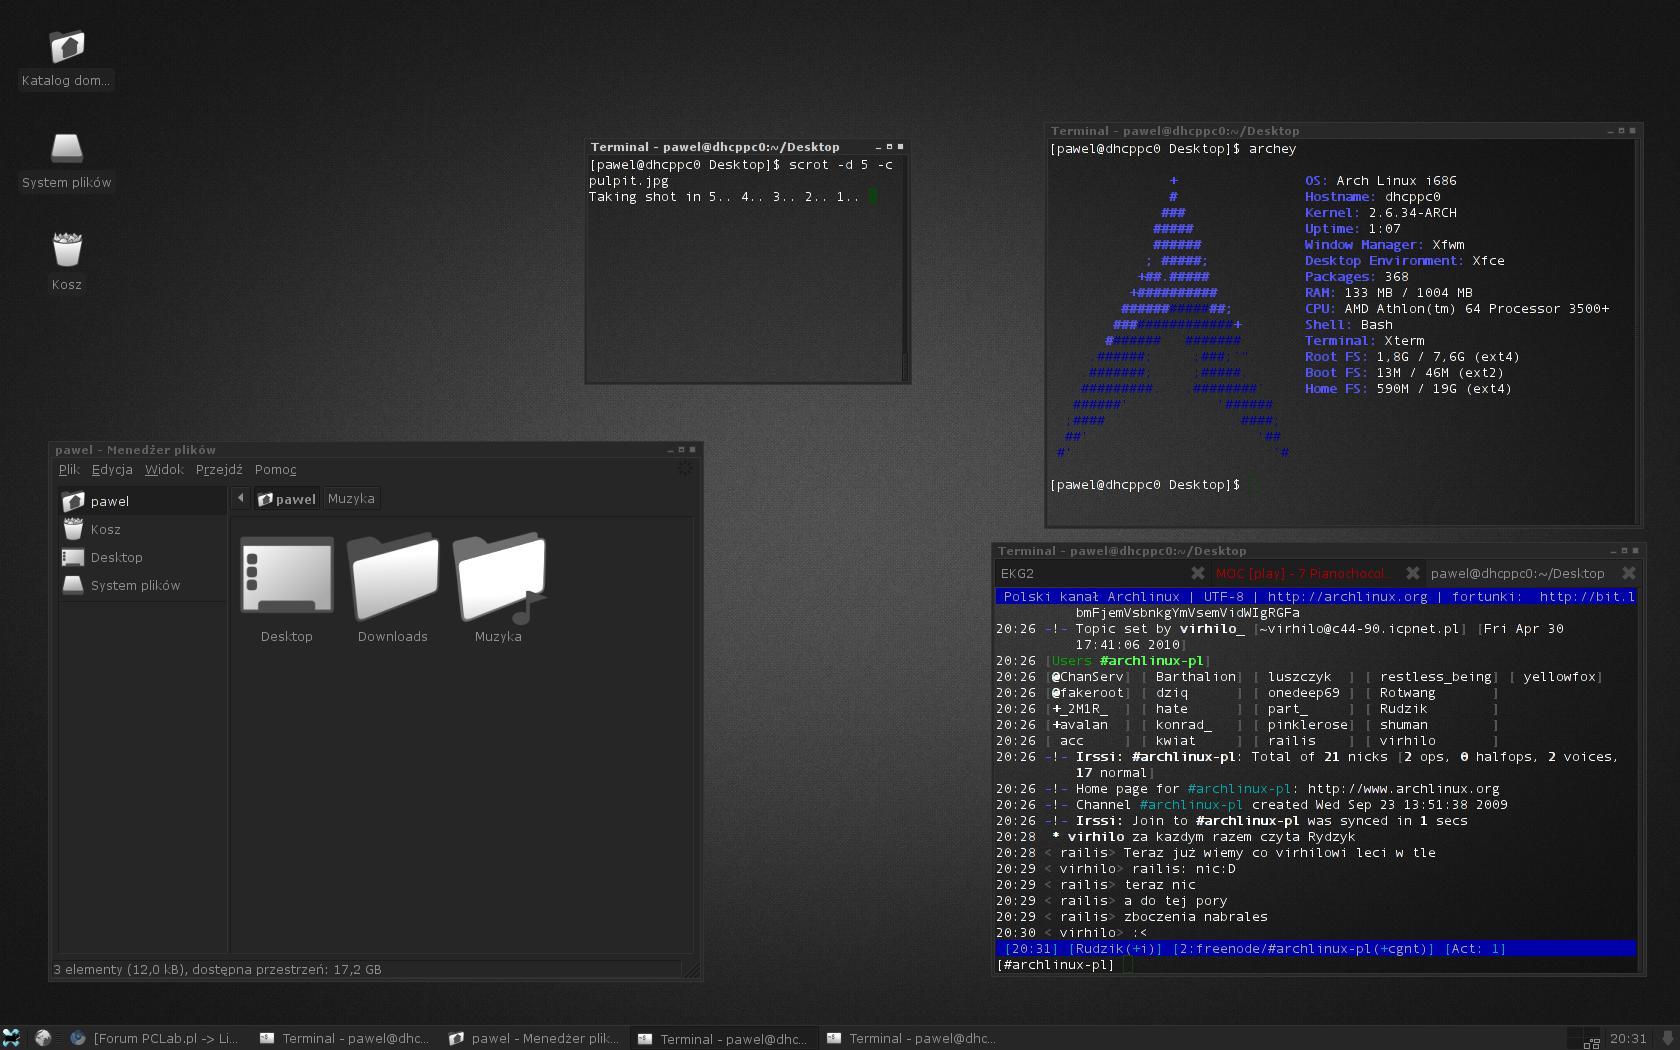 Arch Linux XFCE